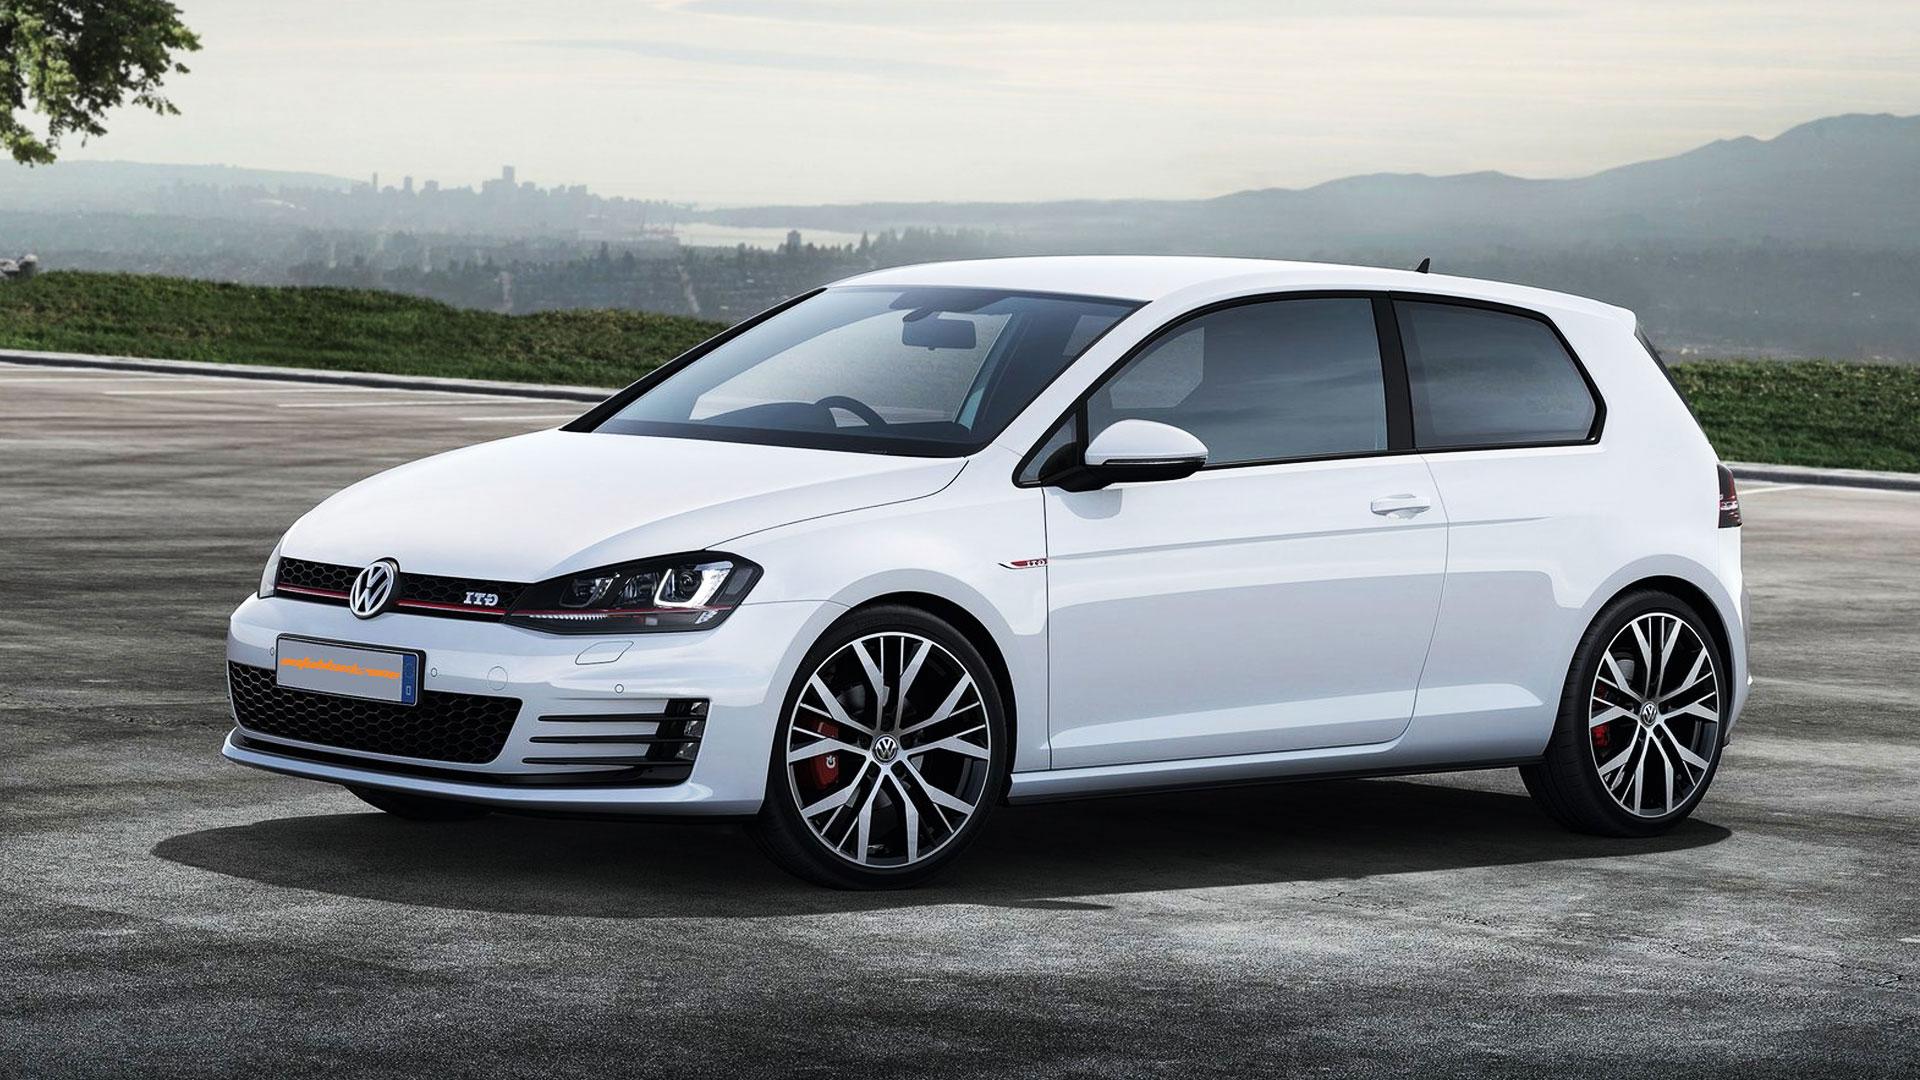 2014 vw gti wallpaper   Car Release Date Reviews 1920x1080